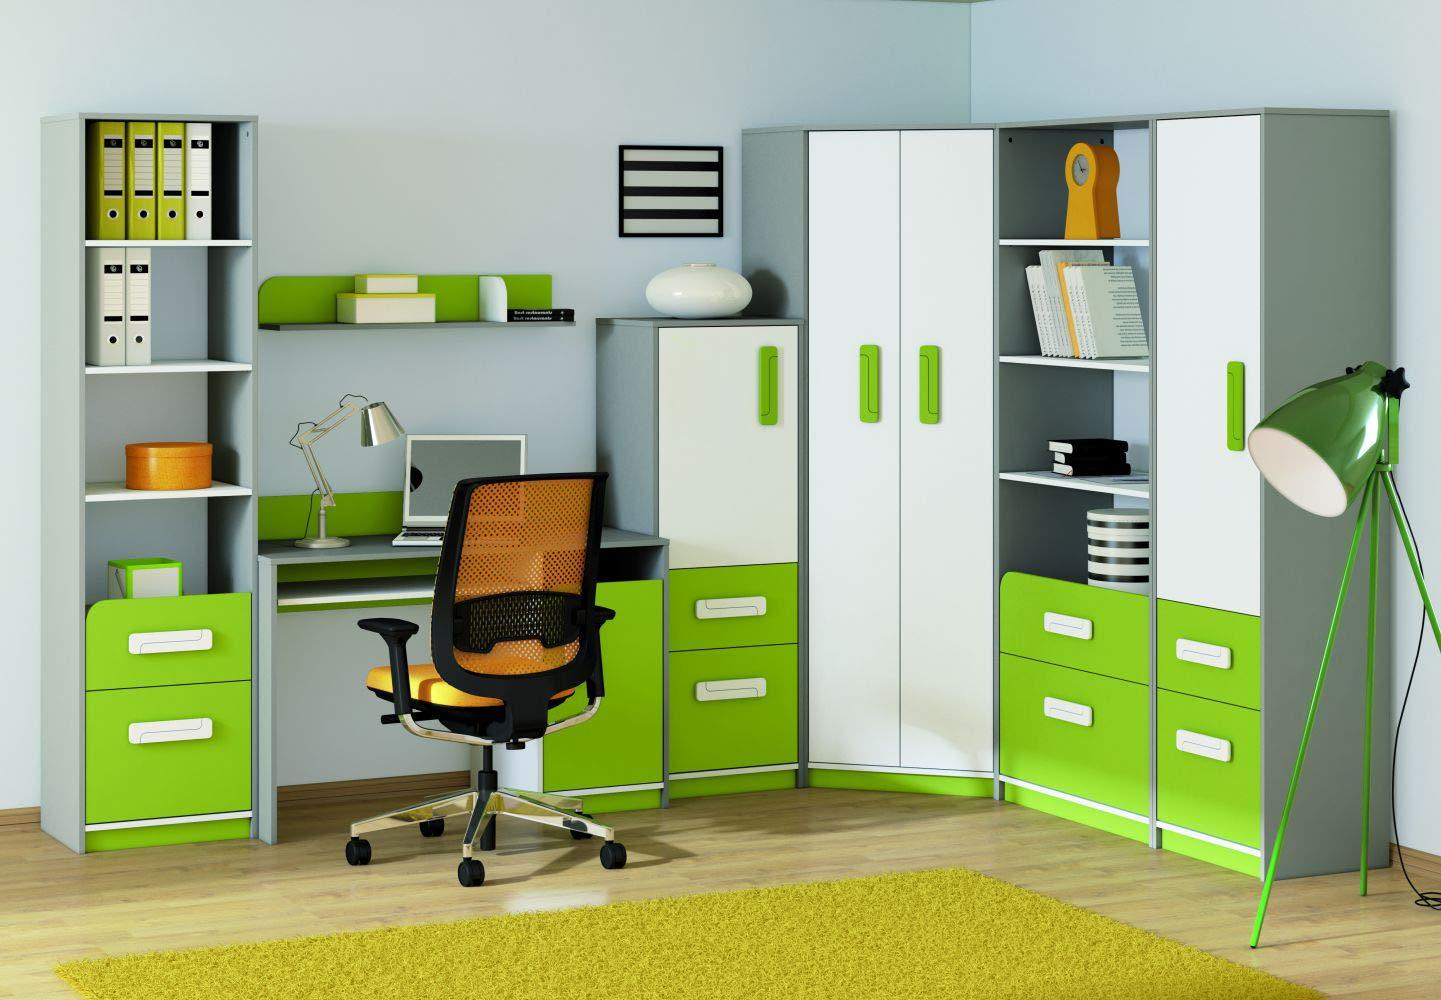 Kinderzimmer Set L Renton, 7-teilig, Farbe: Platingrau/Weiß/Grün